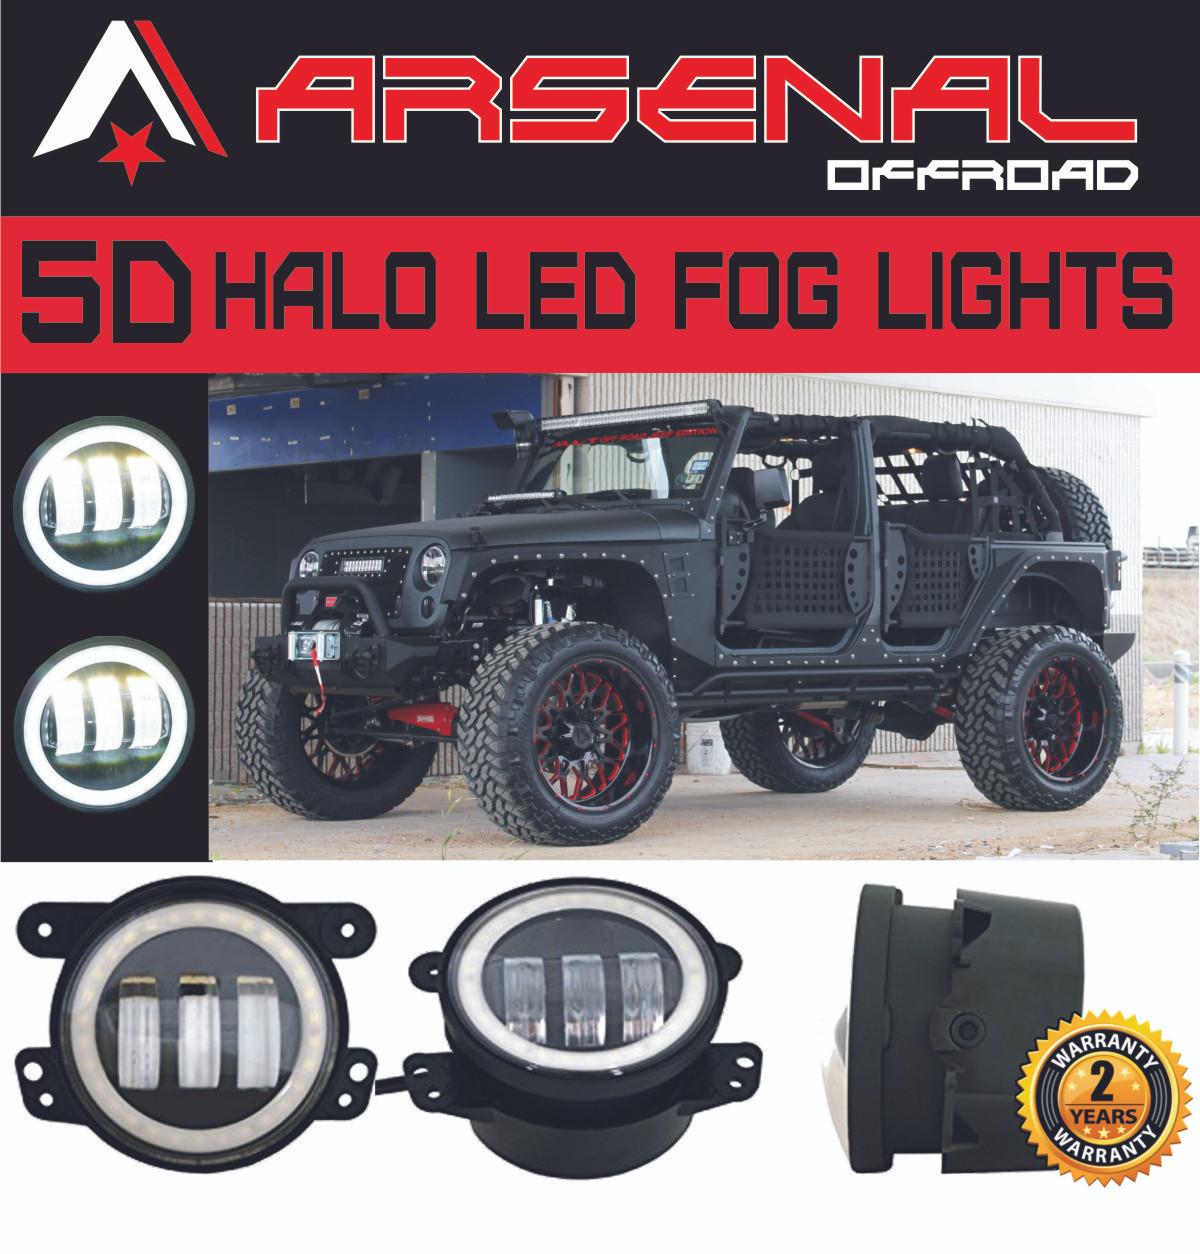 4inch LED Fog Lights OVOTOR 20W Jeep Fog Lamps with White Halo DRL for Jeep Wrangler JK Dodge Chrysler Front Bumper Driving Fog Lights